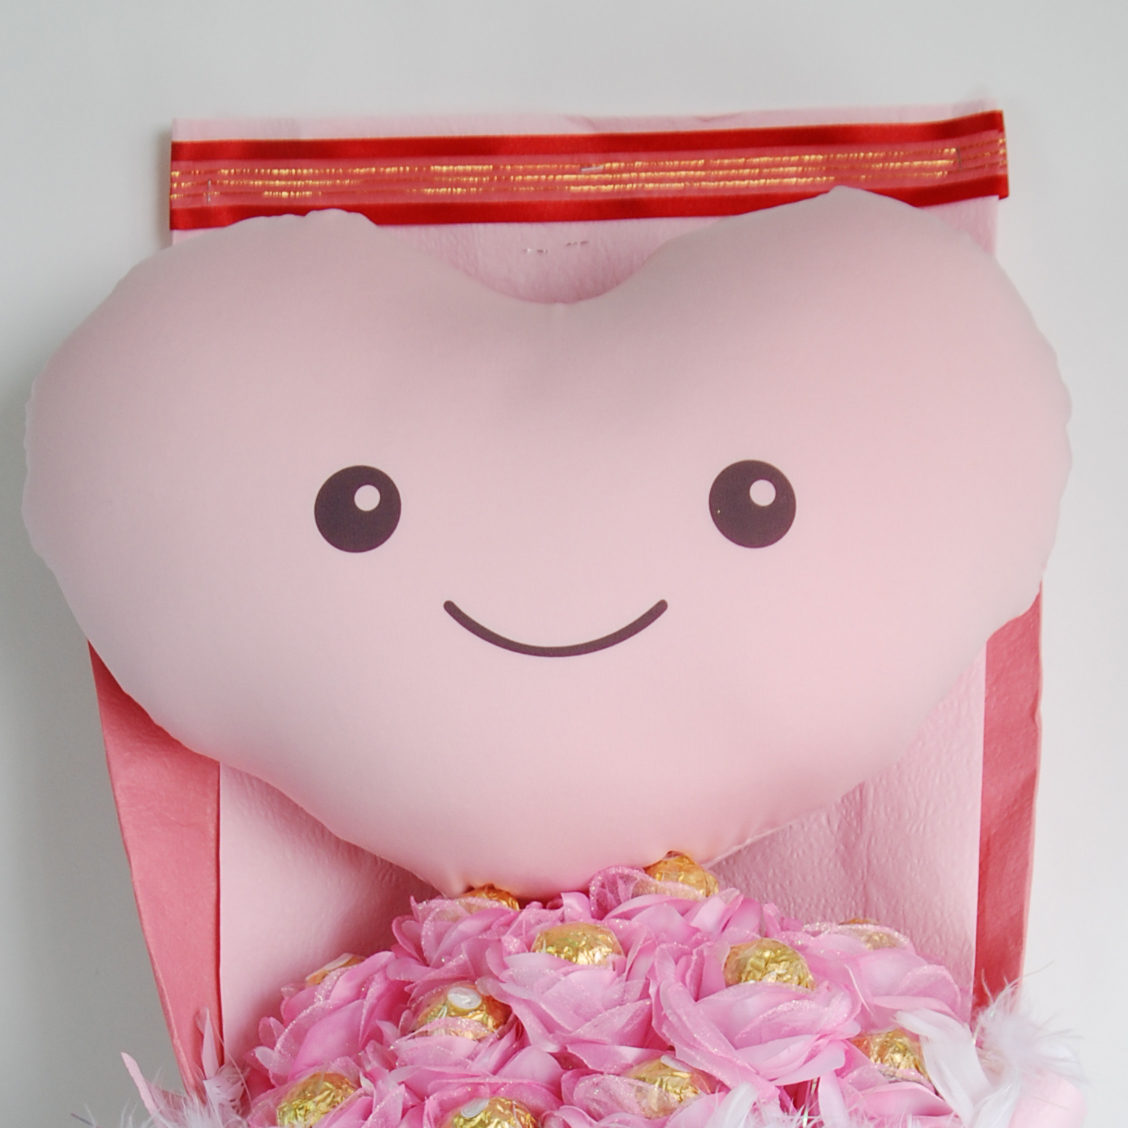 【CG570015微笑甜心花禮組】巧繪網獨家販售 巧克力愛心抱枕花束=金莎花束生日禮物(免運)